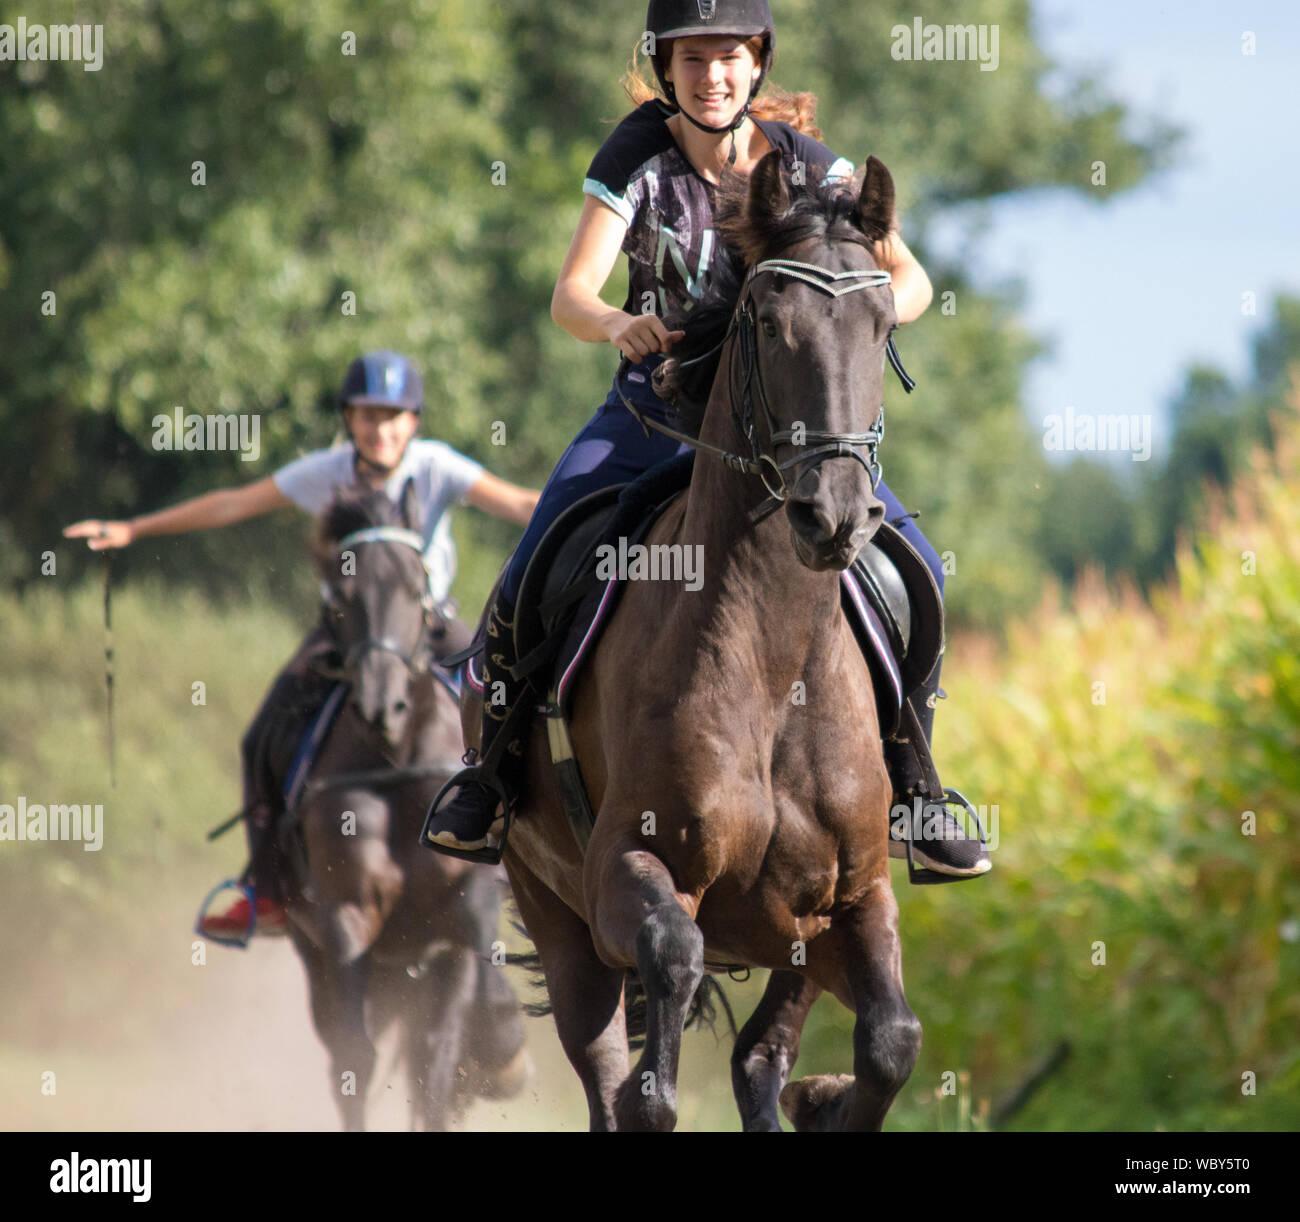 Friends Riding Horses At Park Stock Photo Alamy